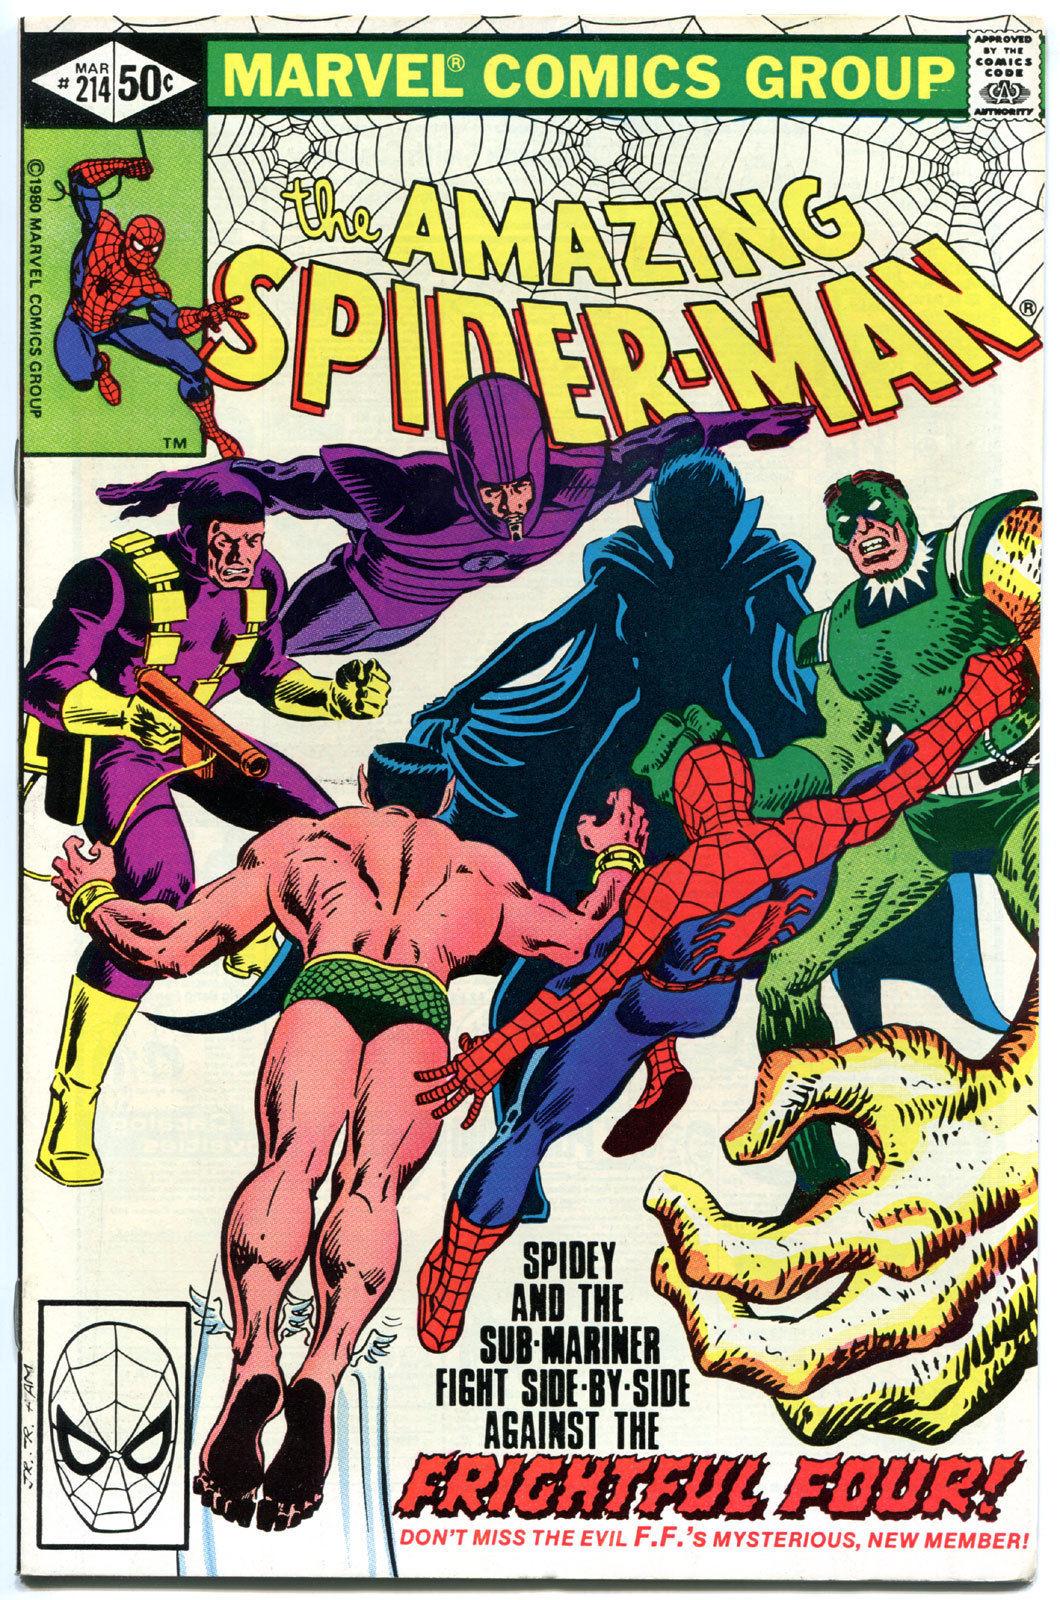 Amazing SPIDER-MAN #214, VF/NM, Sandman, Sub-Mariner,1963, more ASM in store